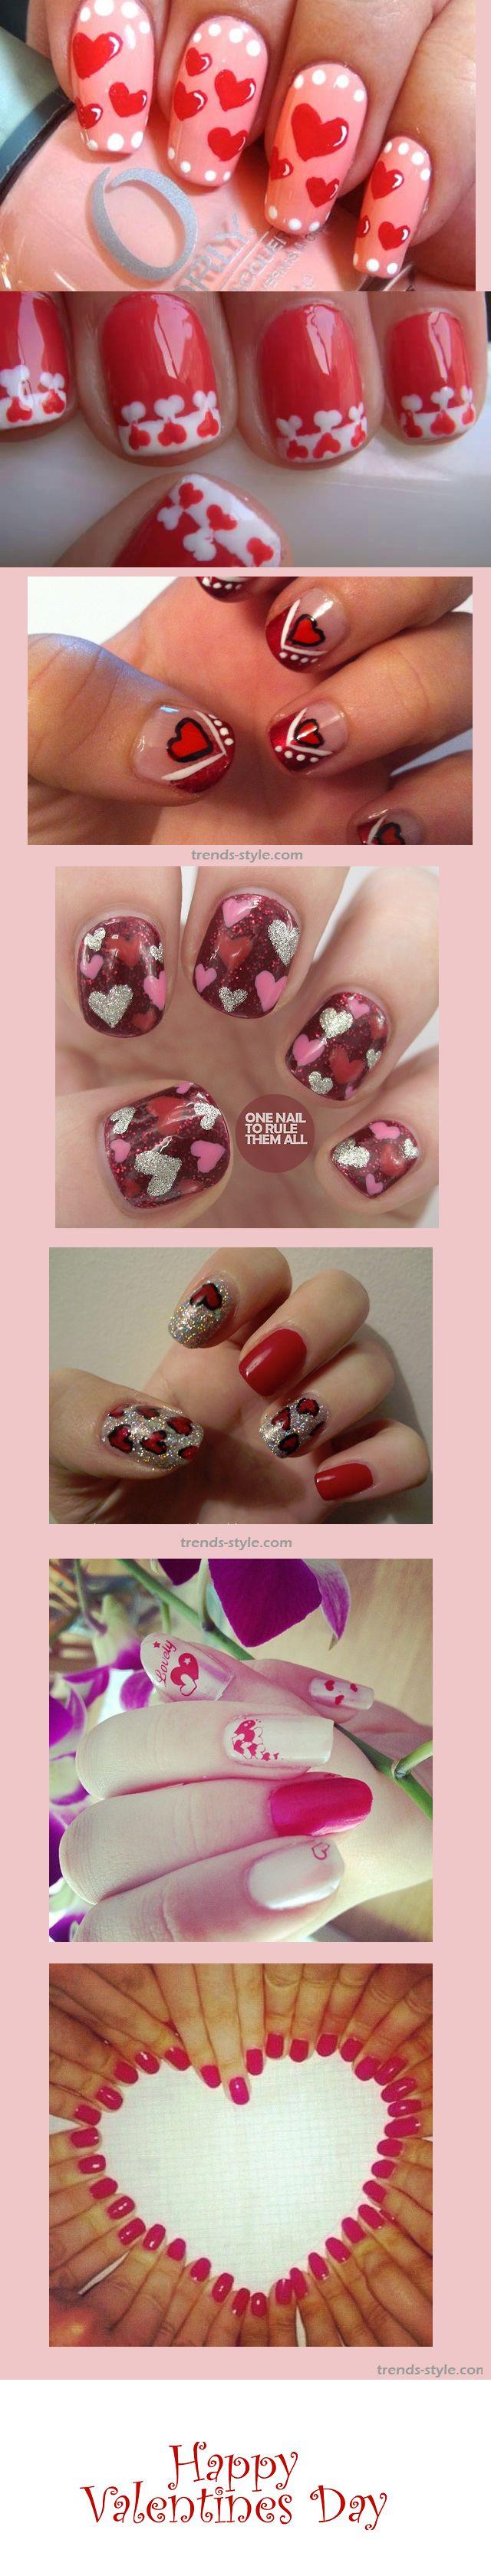 Happy Valentines Day - valentines day nail art